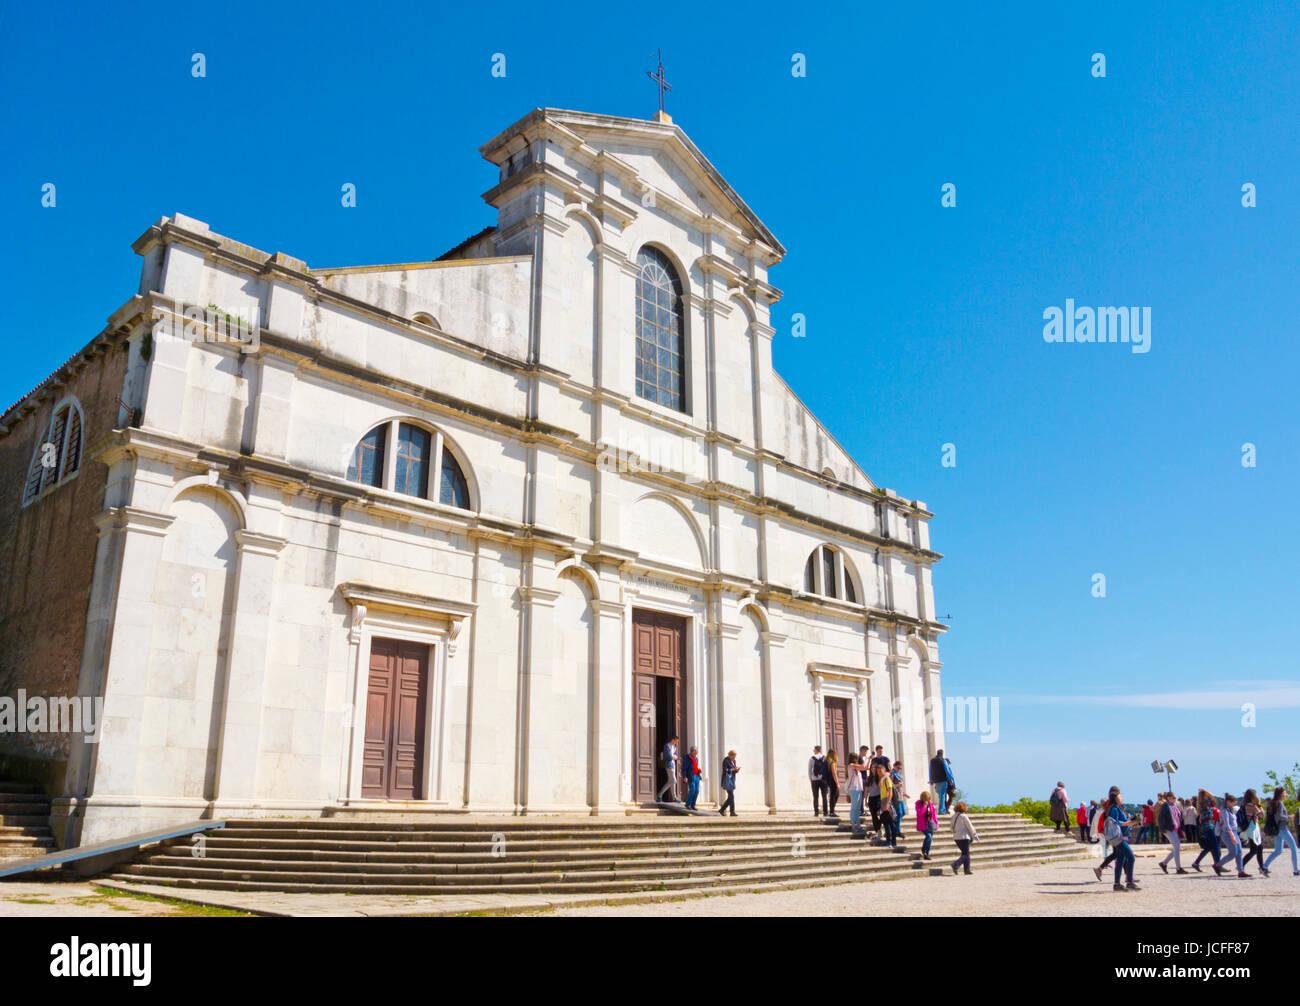 Sveta Eufemija, Saint Euphemia, Rovinj, Istria, Croatia - Stock Image